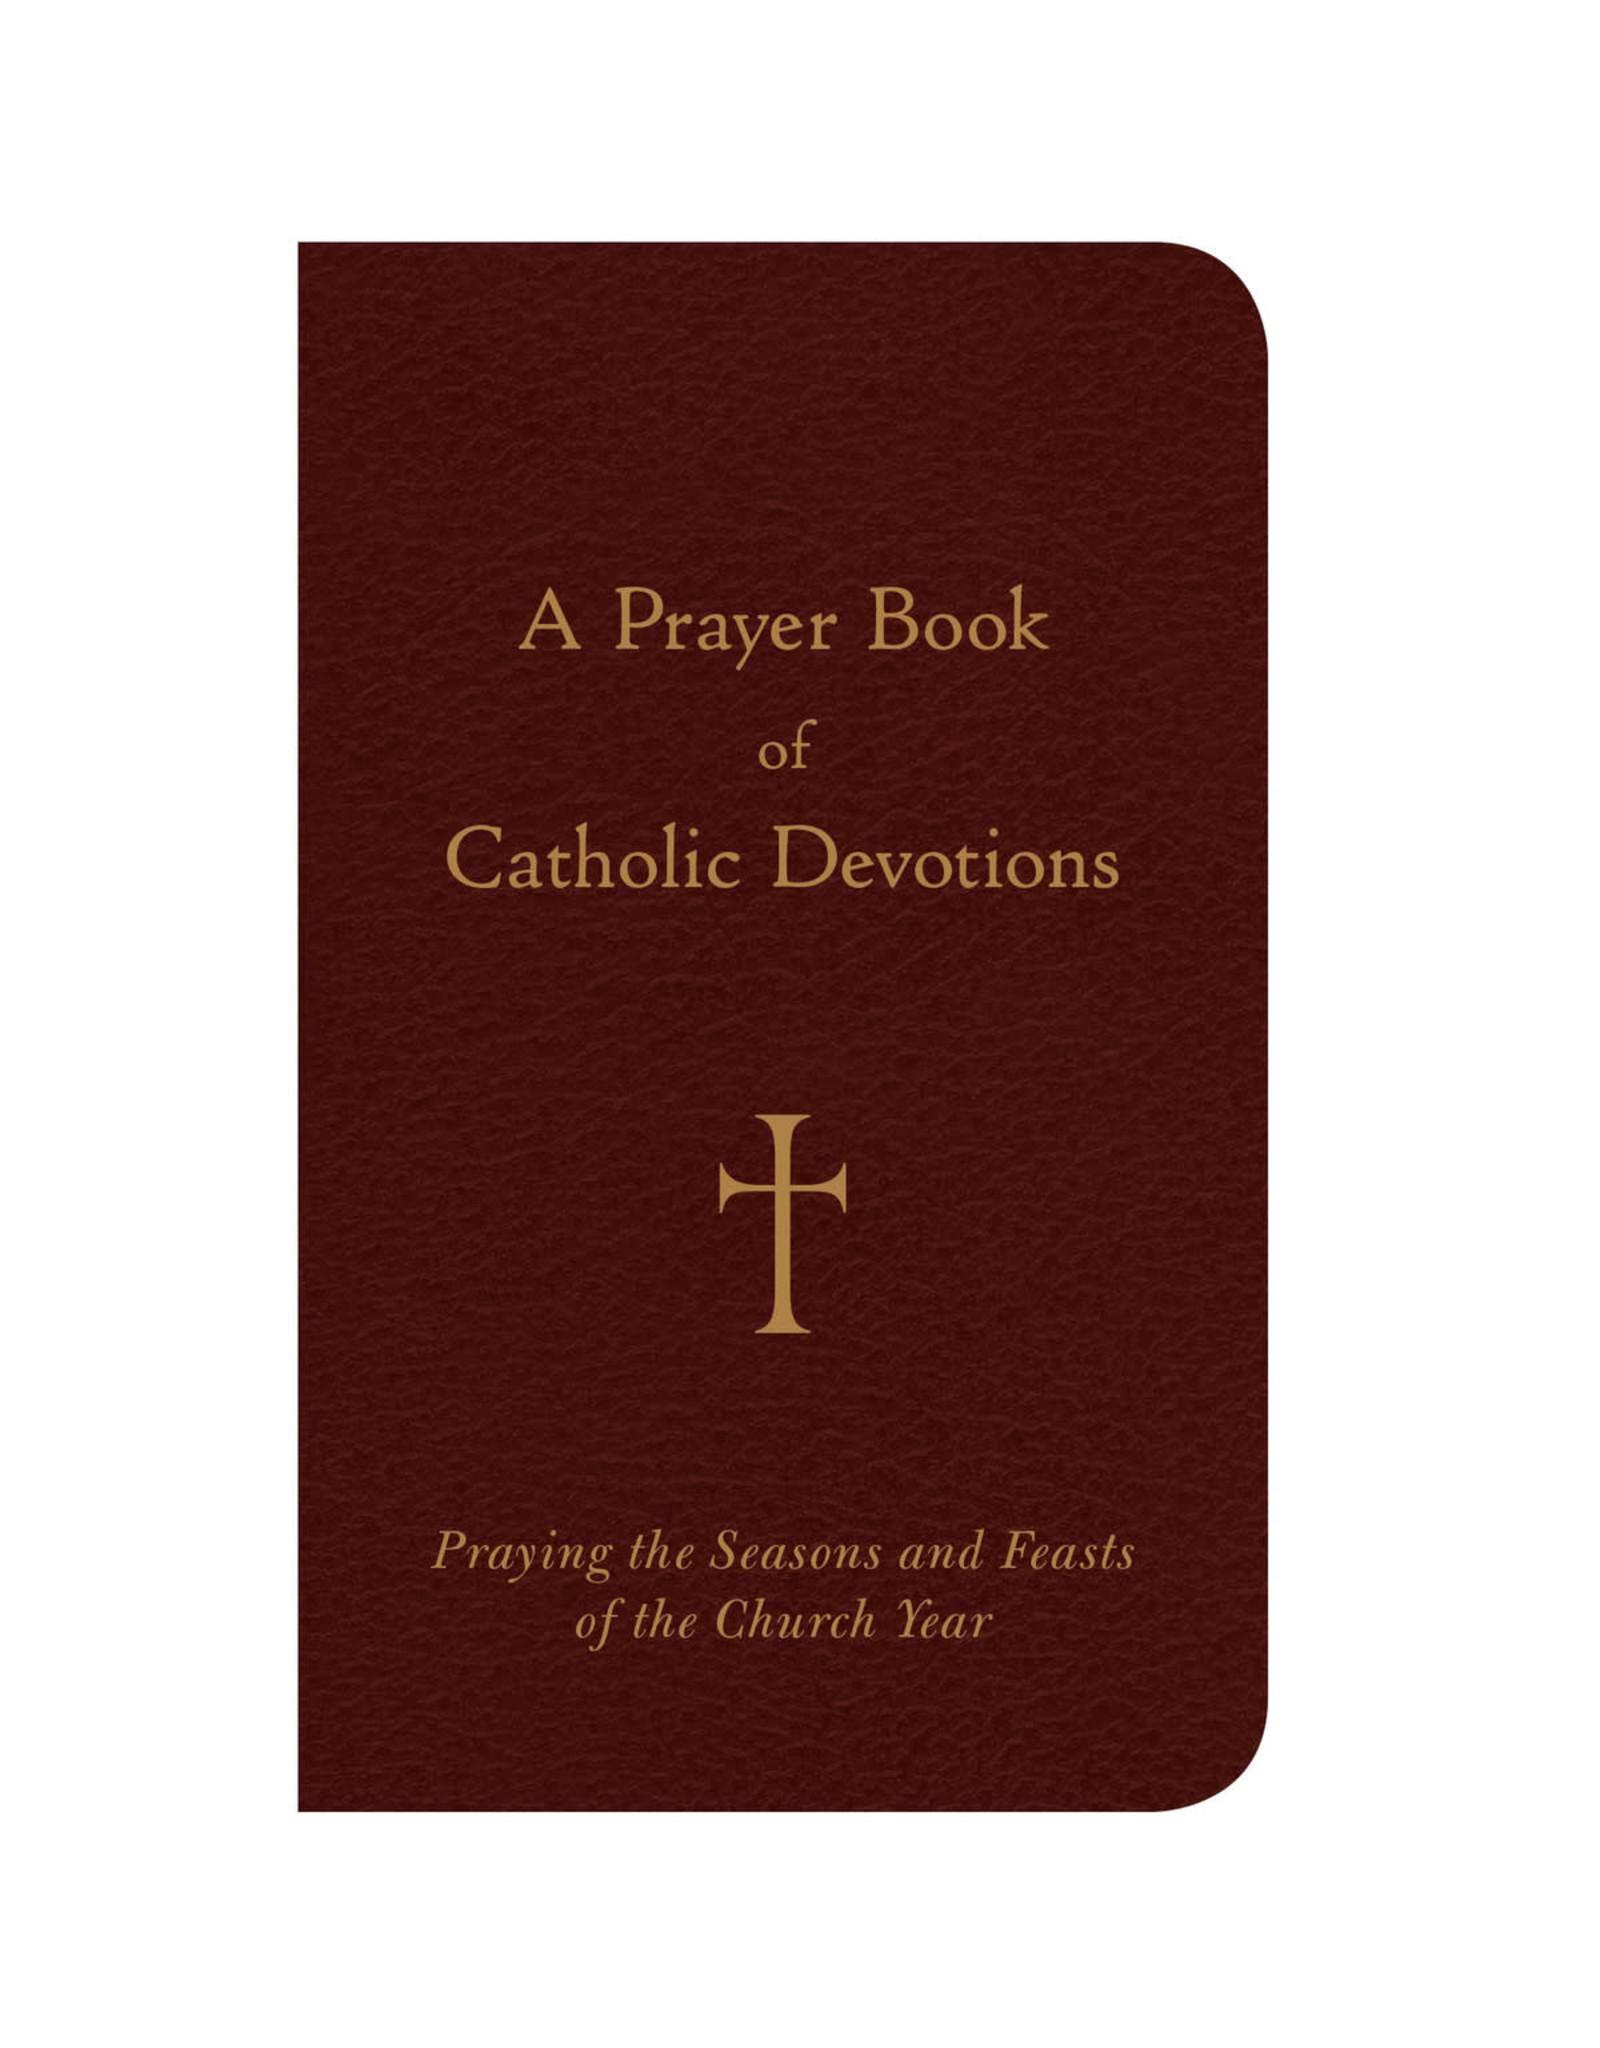 A Prayer Book of Catholic Devotions